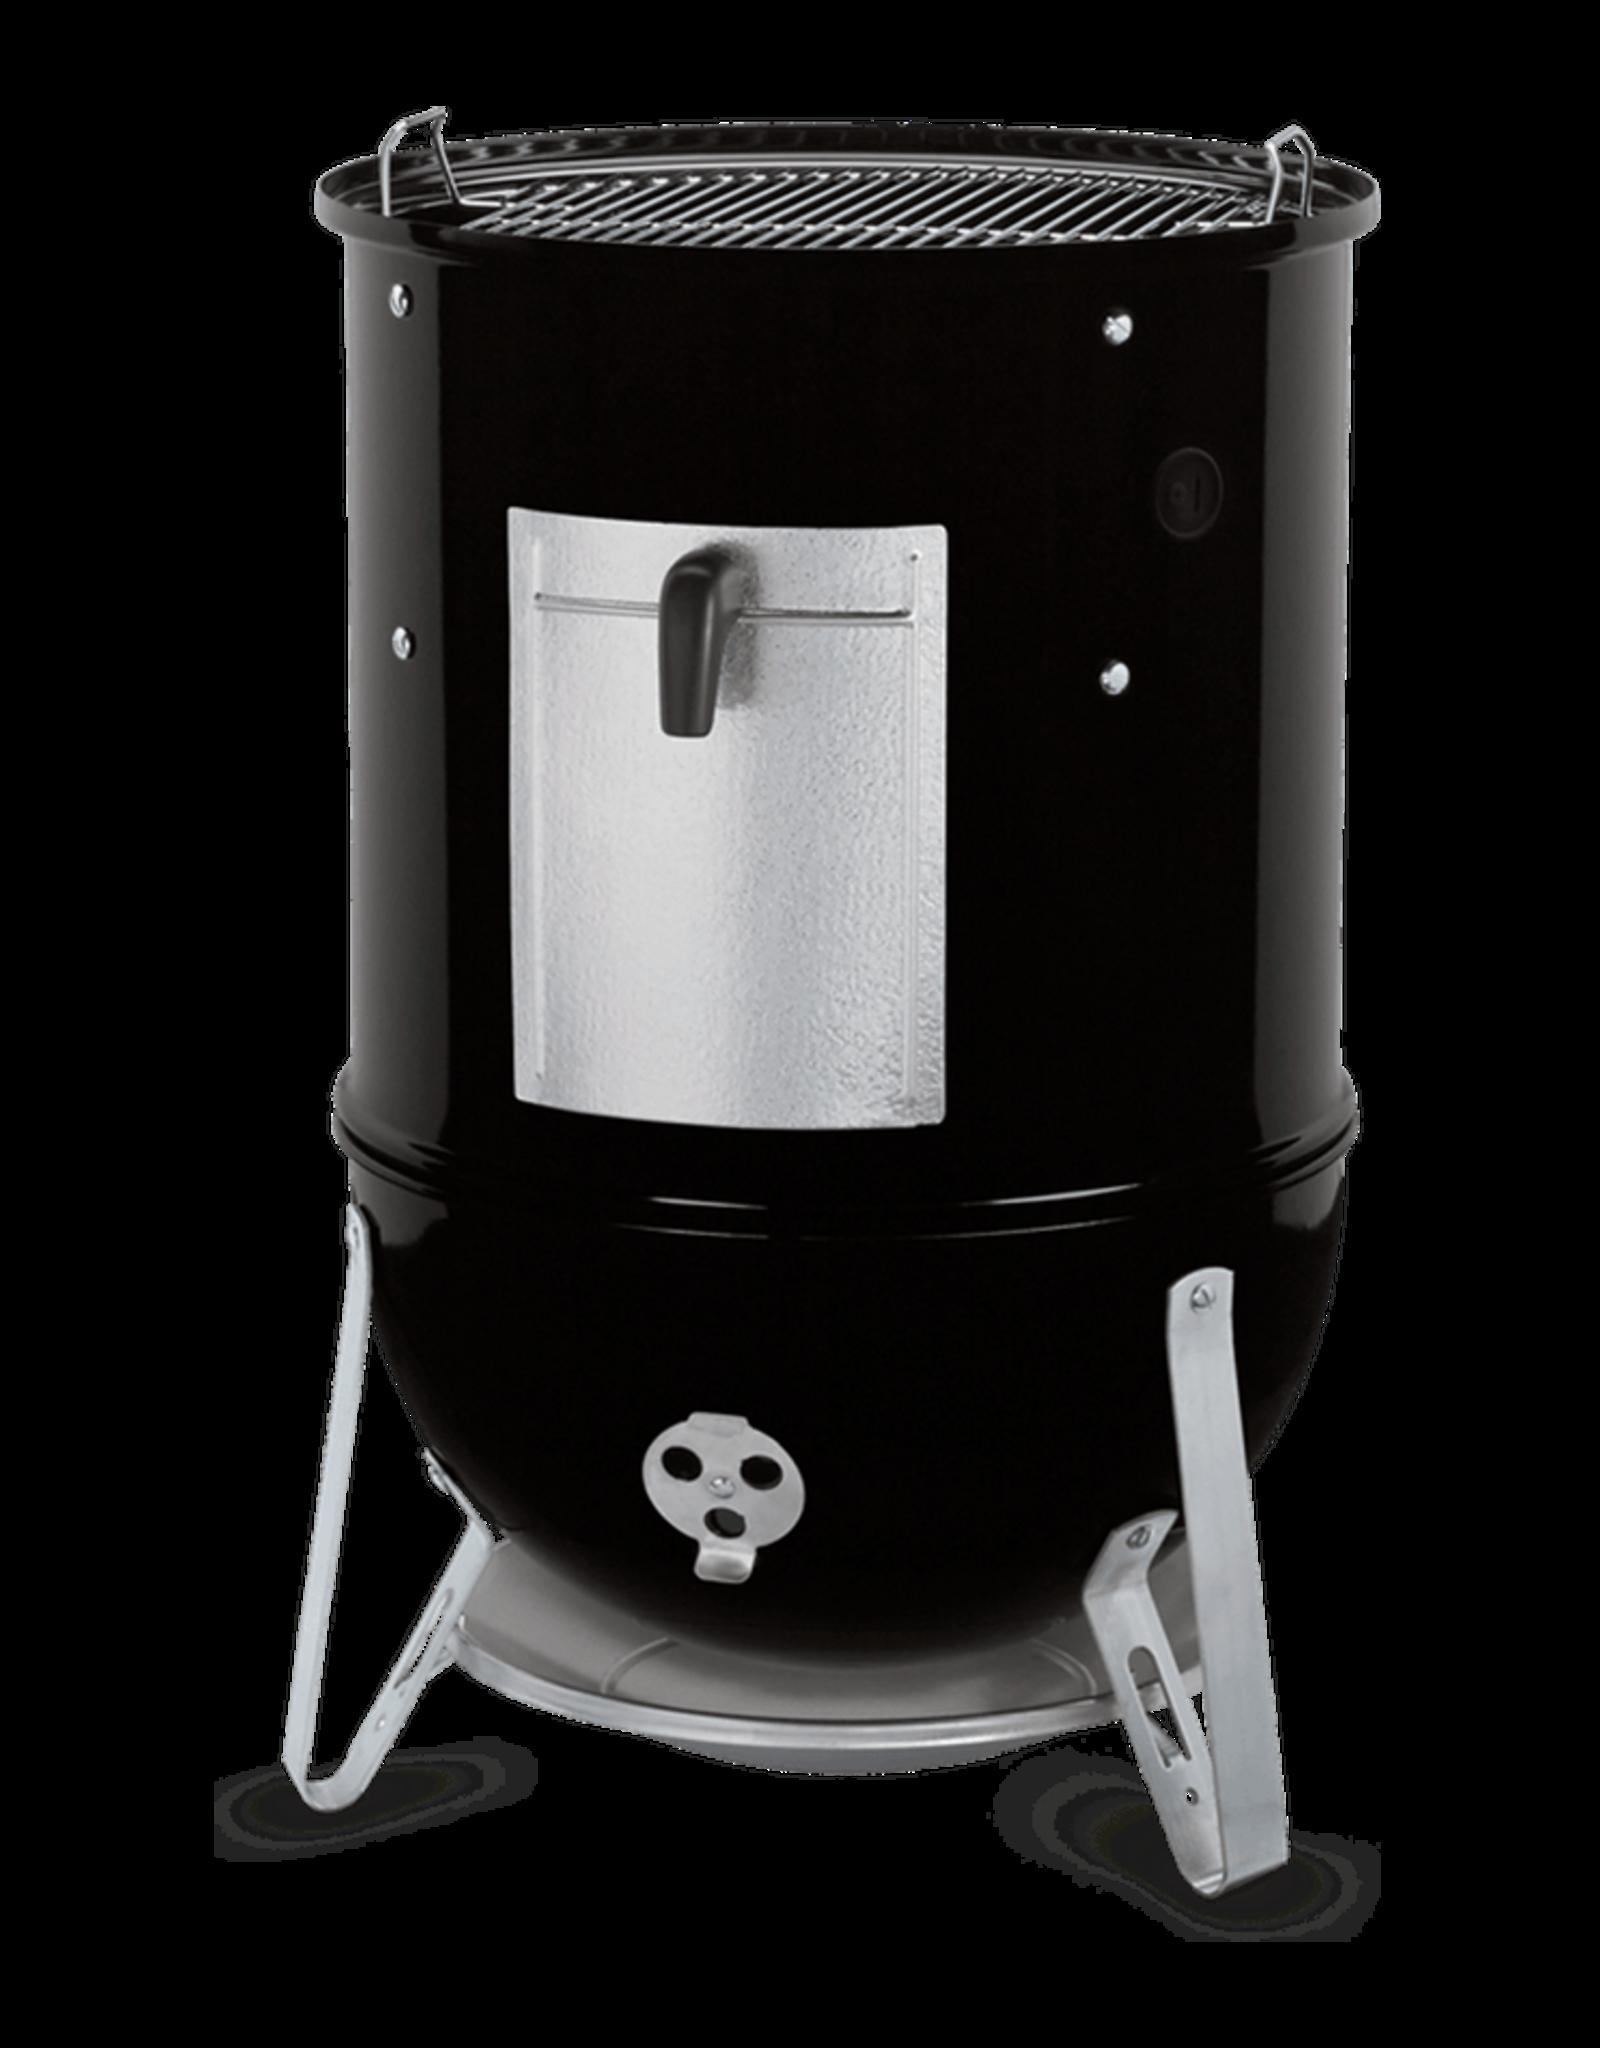 Weber Smokey Mountain Cooker 18'' Smoker Black 721001